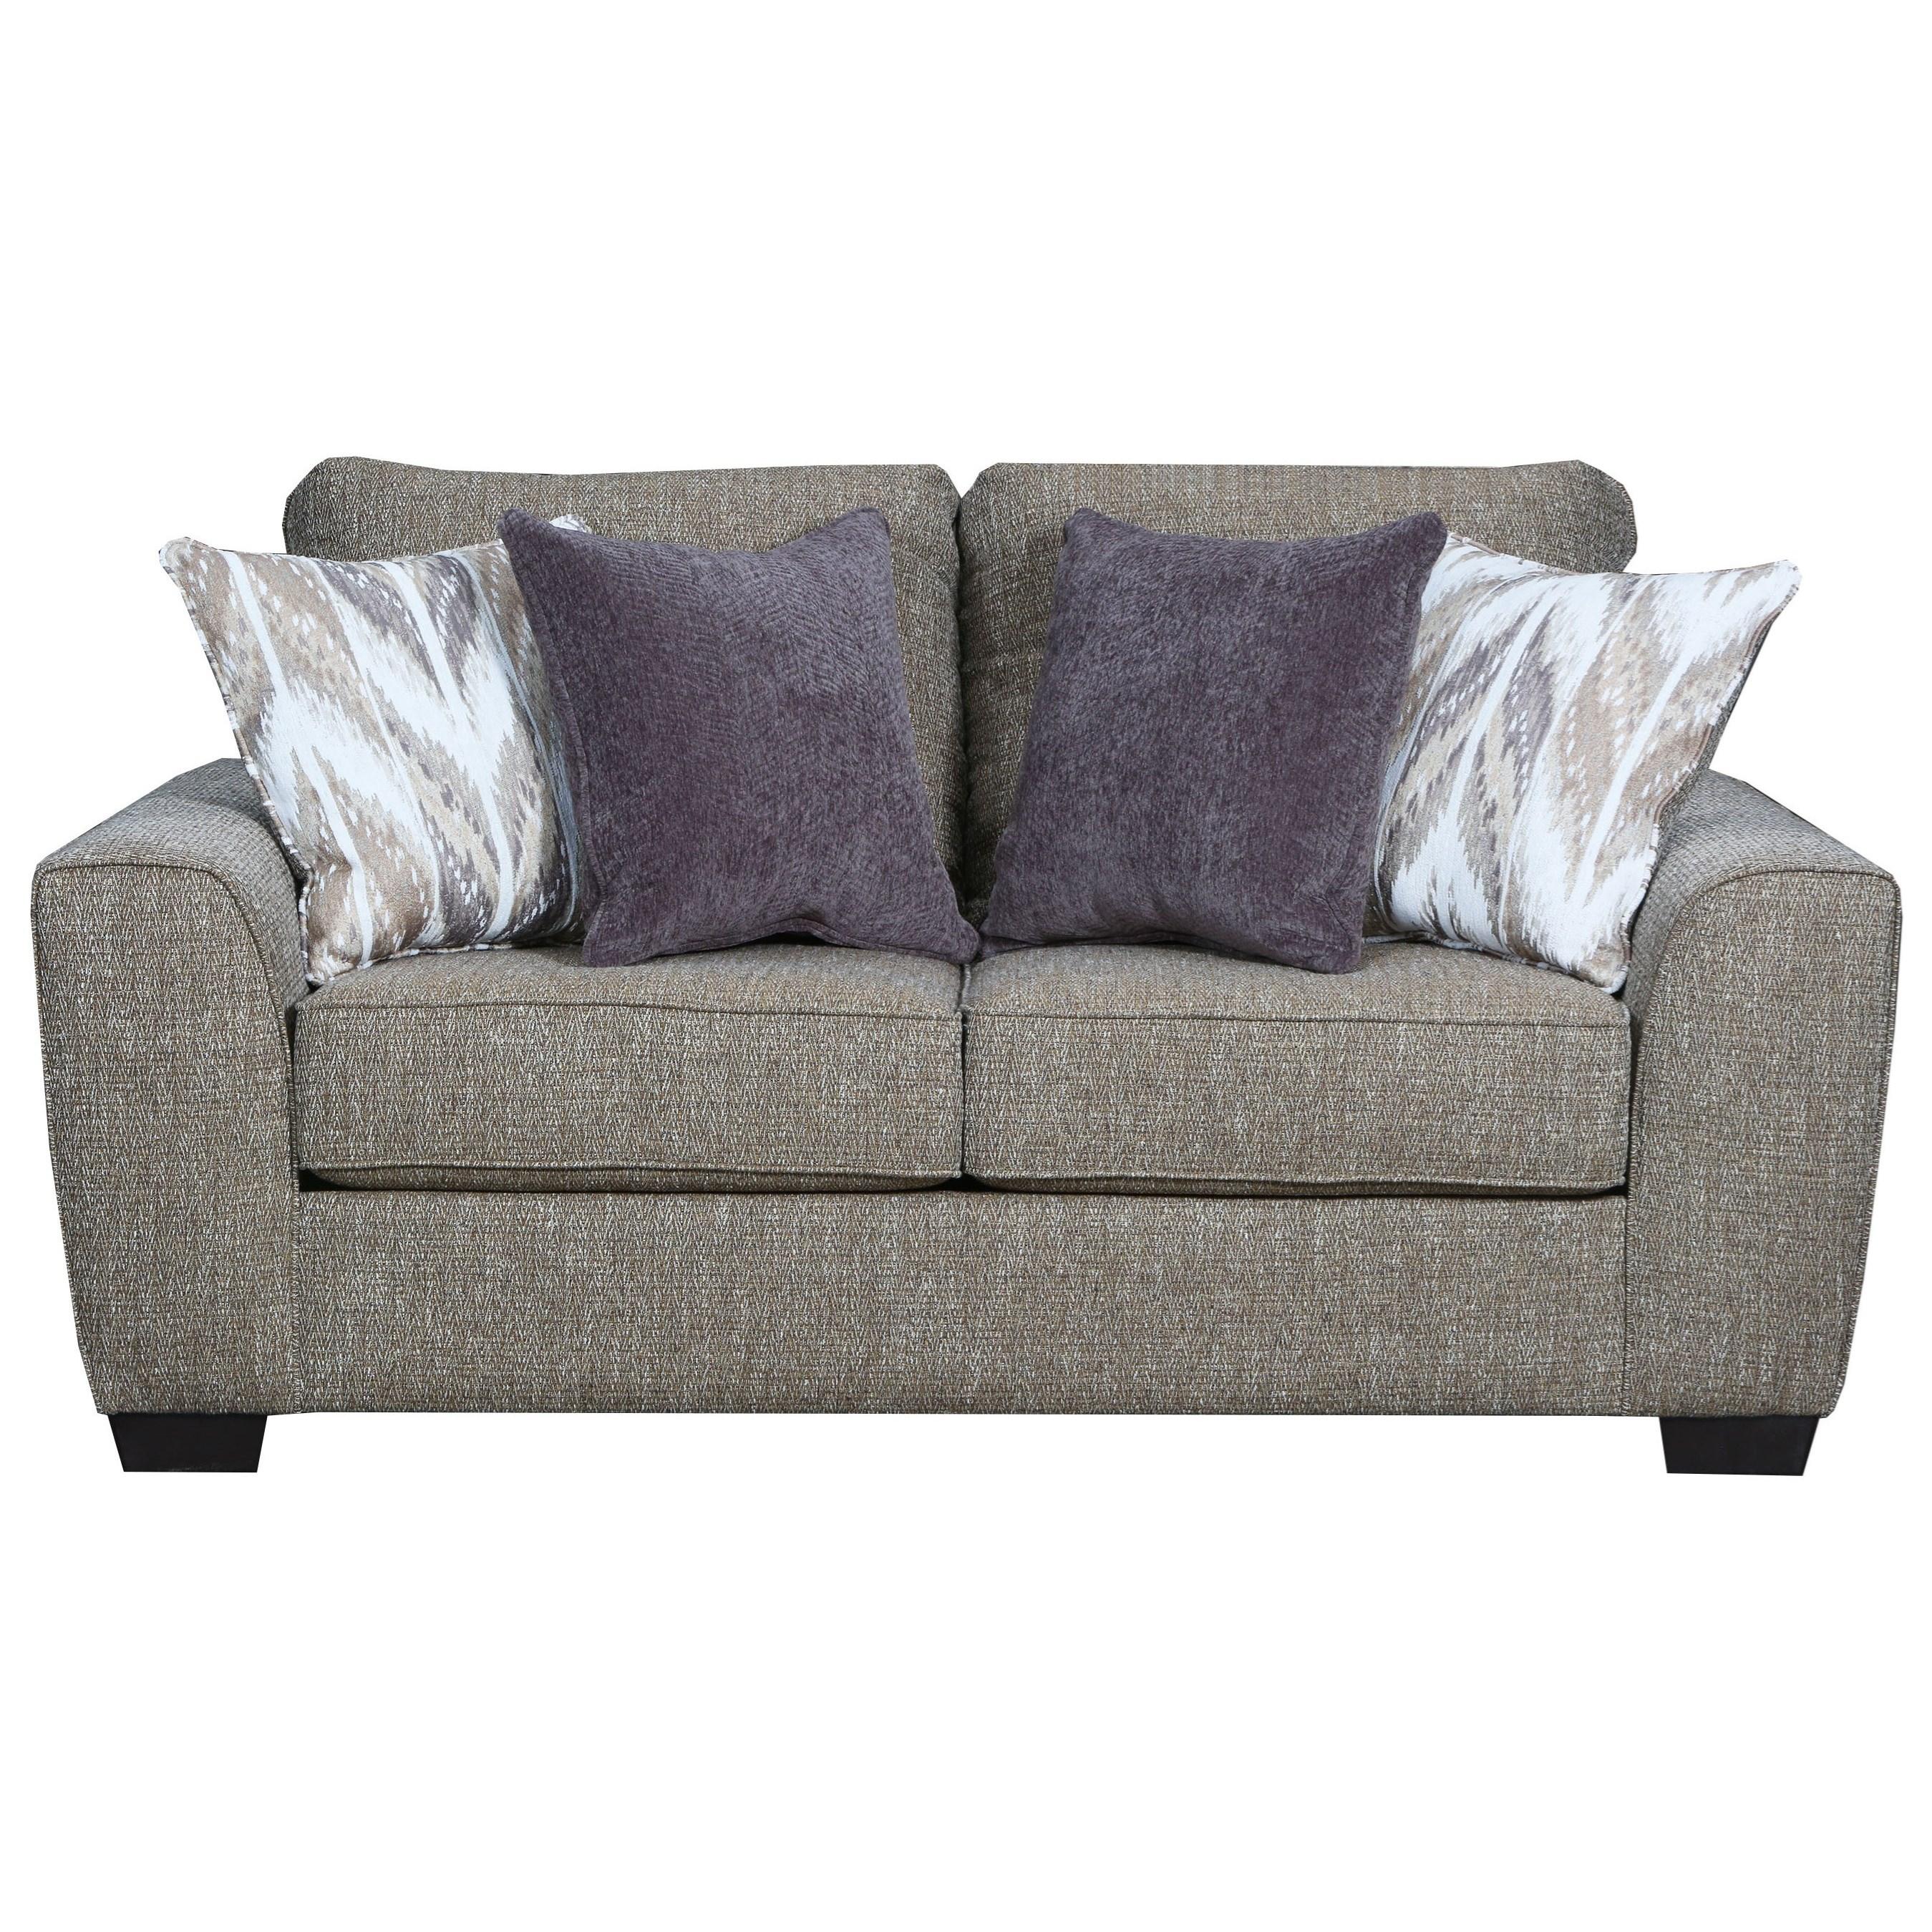 United Furniture Industries 9770BR Love Seat - Item Number: 9770BRLoveseat-Paradise Sisal